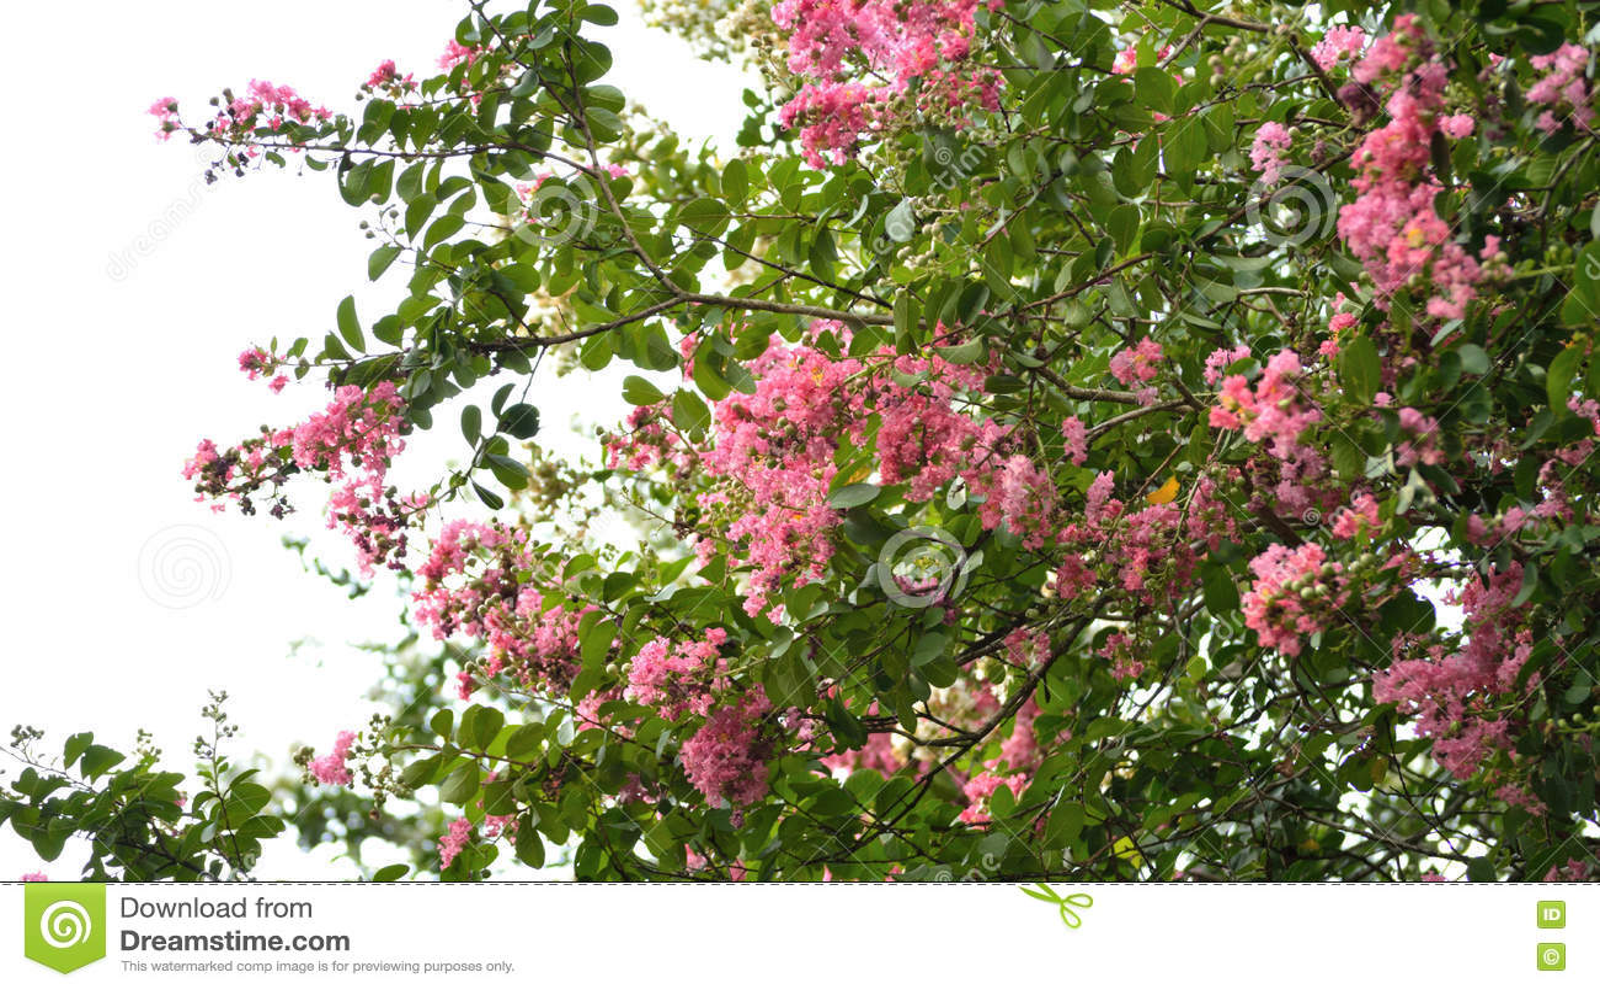 arbre rose de myrte de cr pe en fleur contre le ciel image stock image du bleu cr pe 77743121. Black Bedroom Furniture Sets. Home Design Ideas